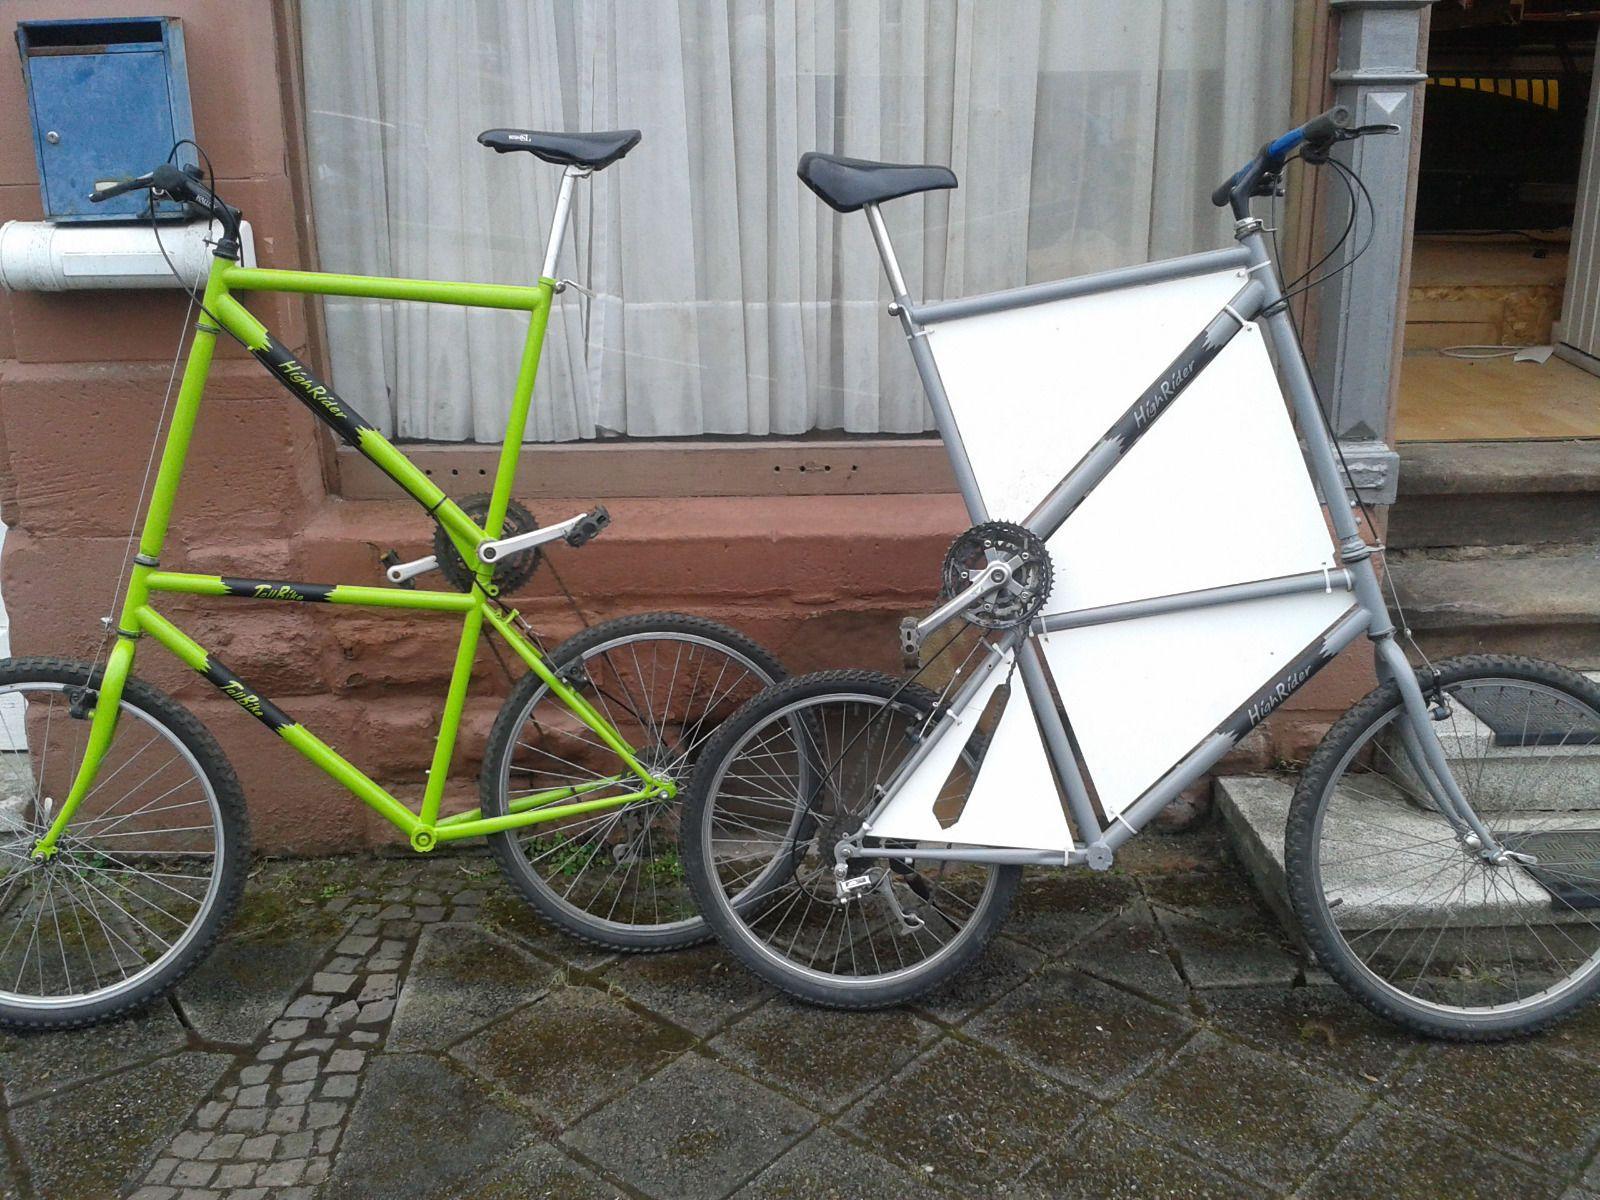 Farthing Tall Bike Homemade Racing Ladies Bike Mountain Bike Gents High Rider Ebay Bicycle Design Womens Bike Bicycle